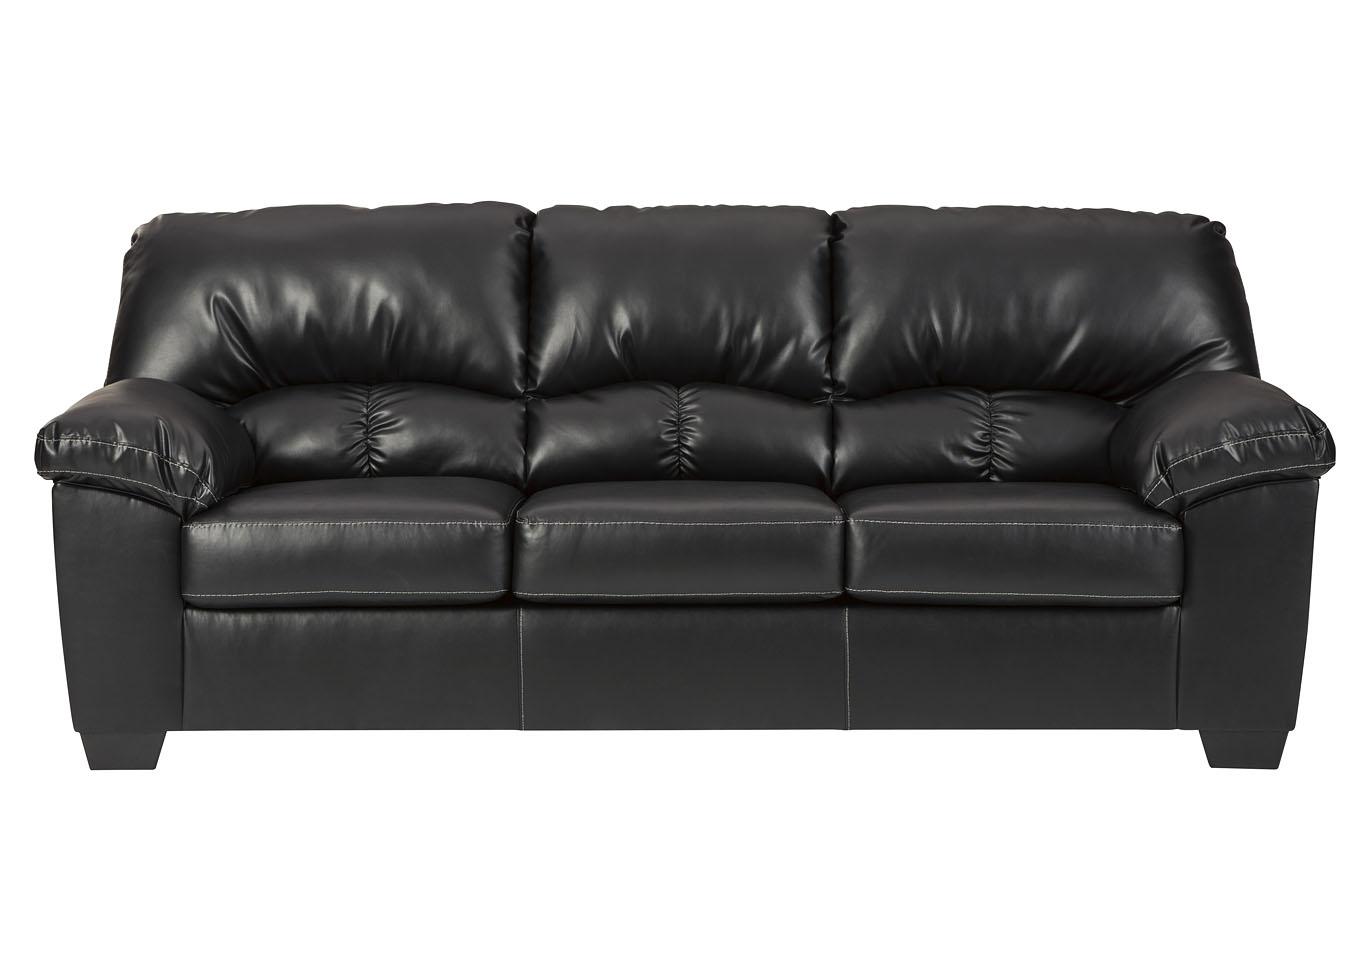 Furniture Elegance Brazoria Black Sofa